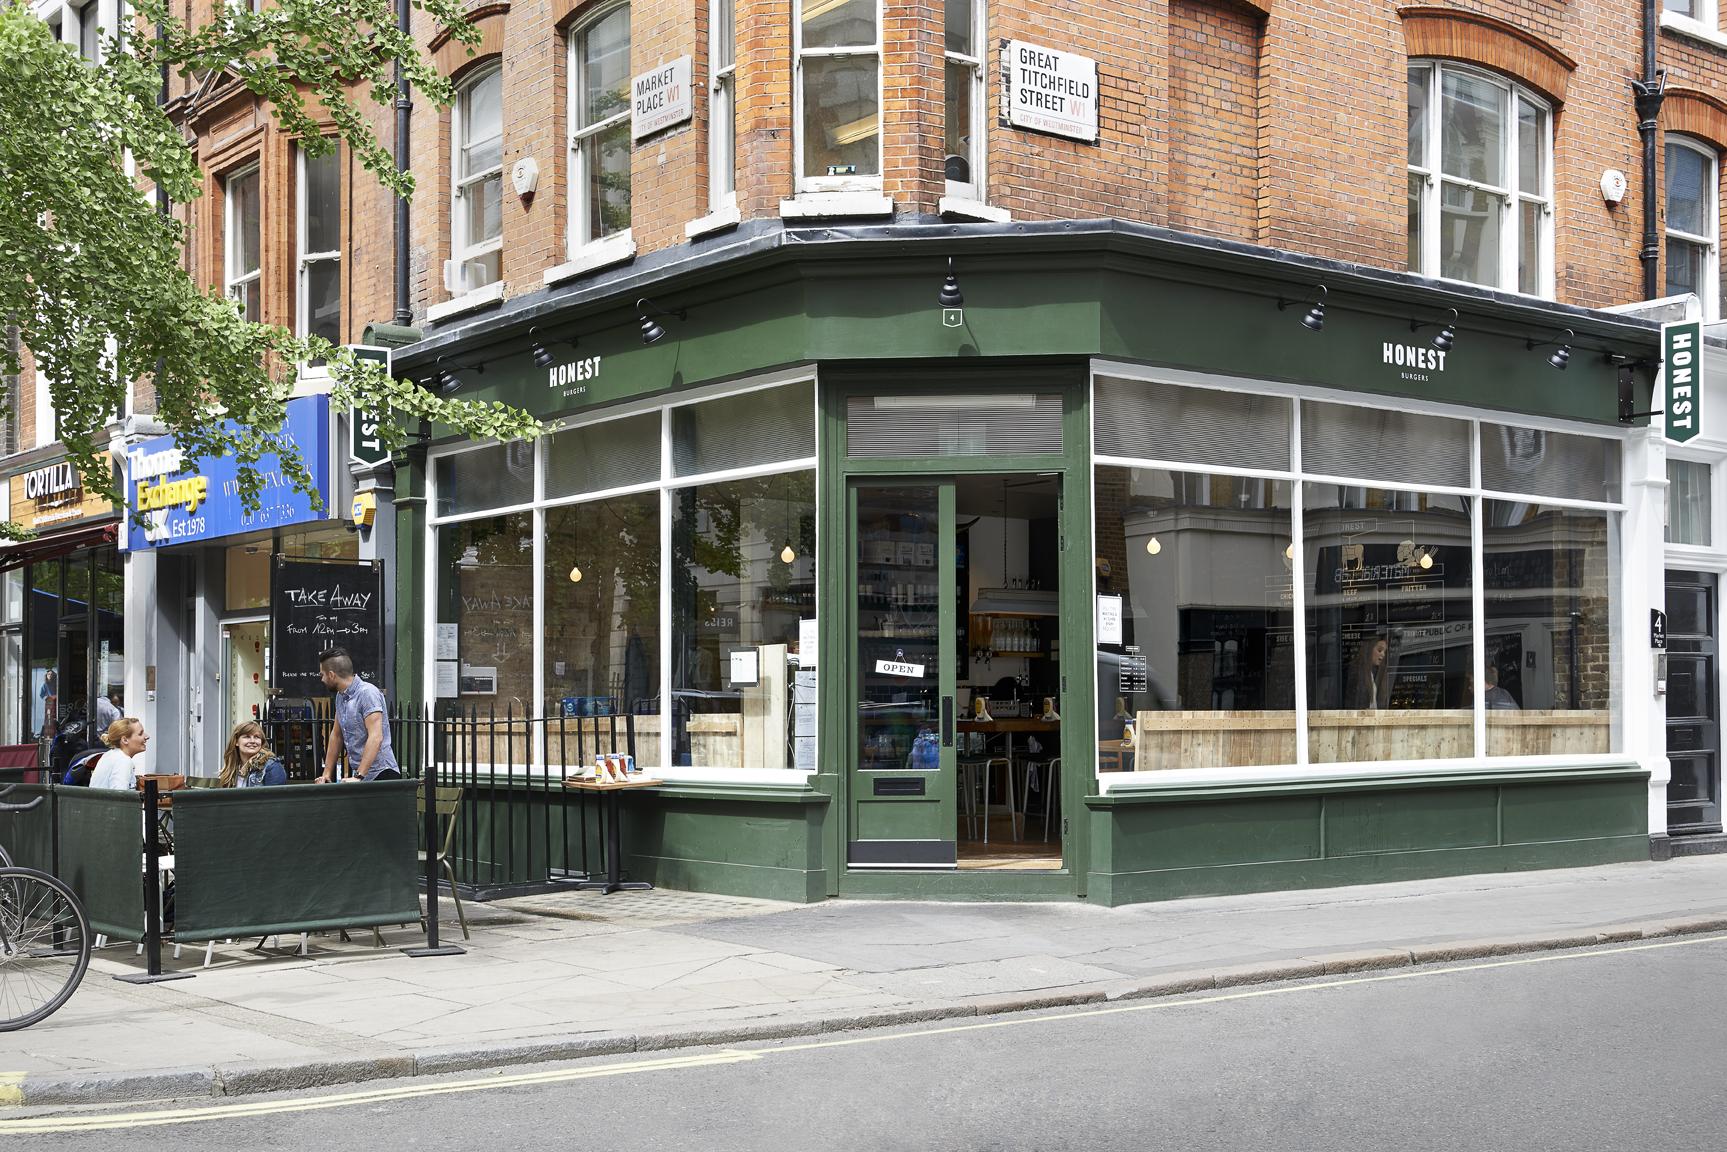 Honest Burgers brand new restaurant on Marketplace, just behind London's Oxford Street.